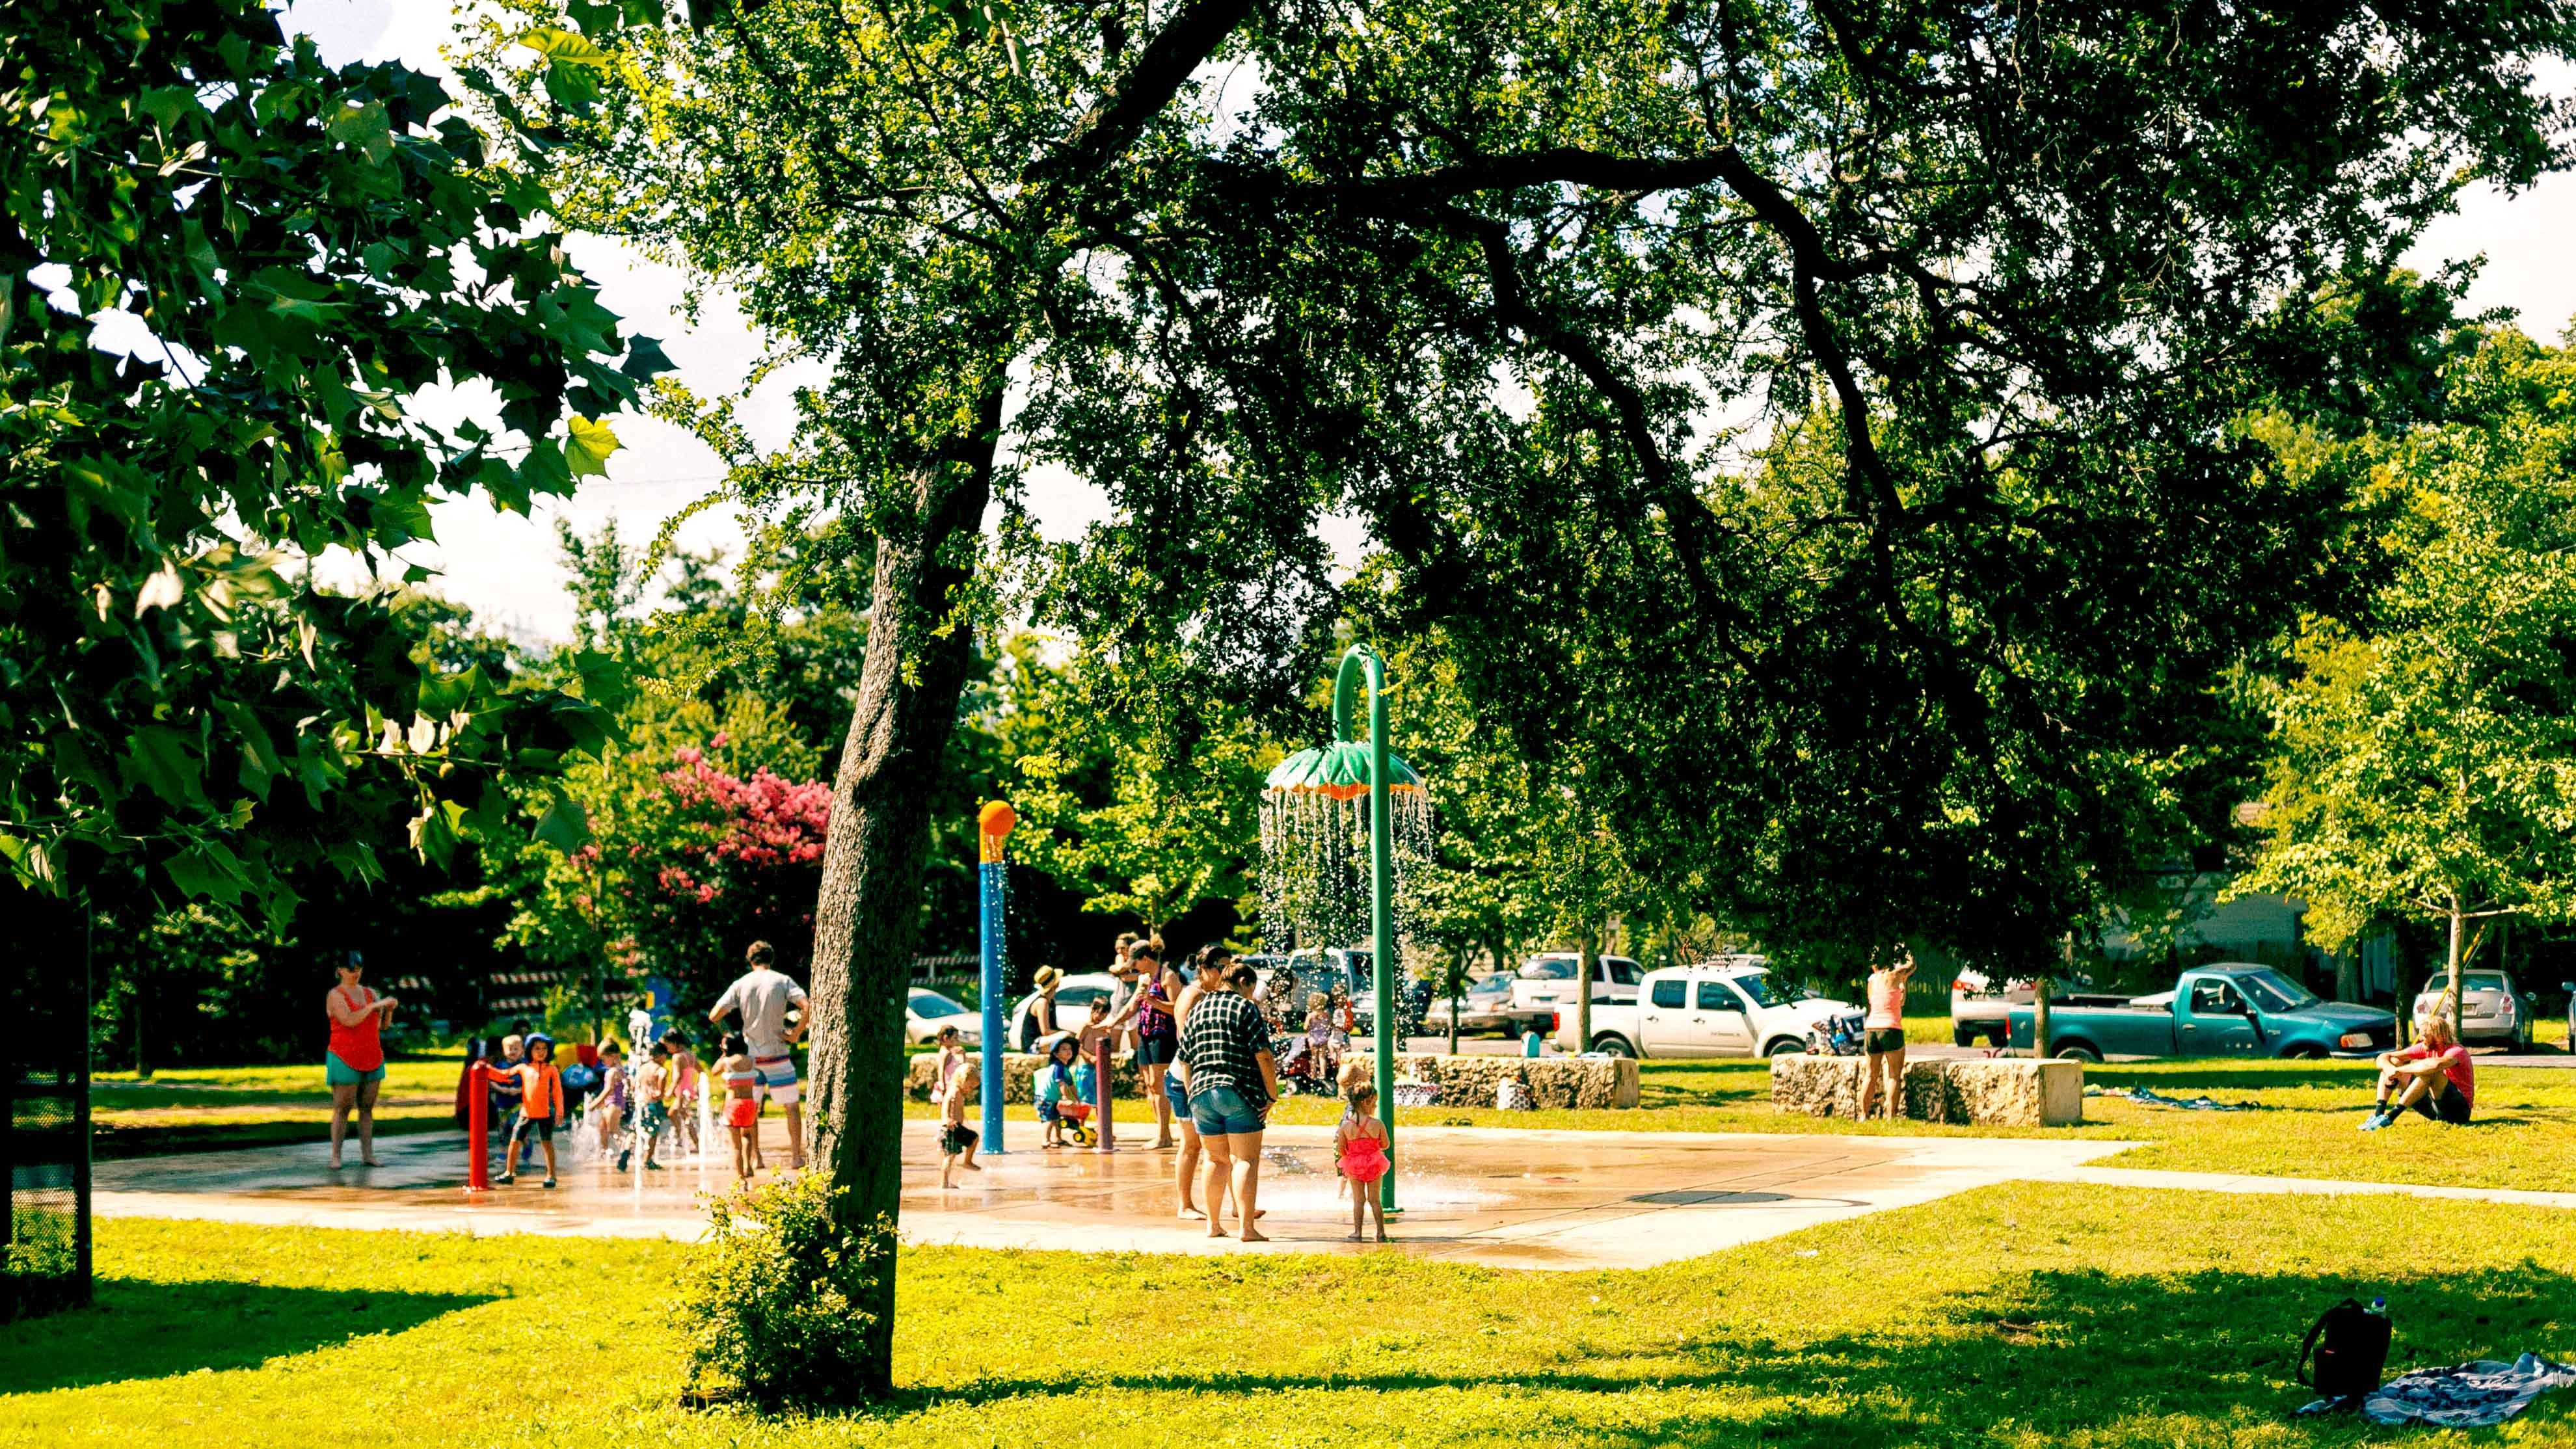 Image of Pease Splash Park